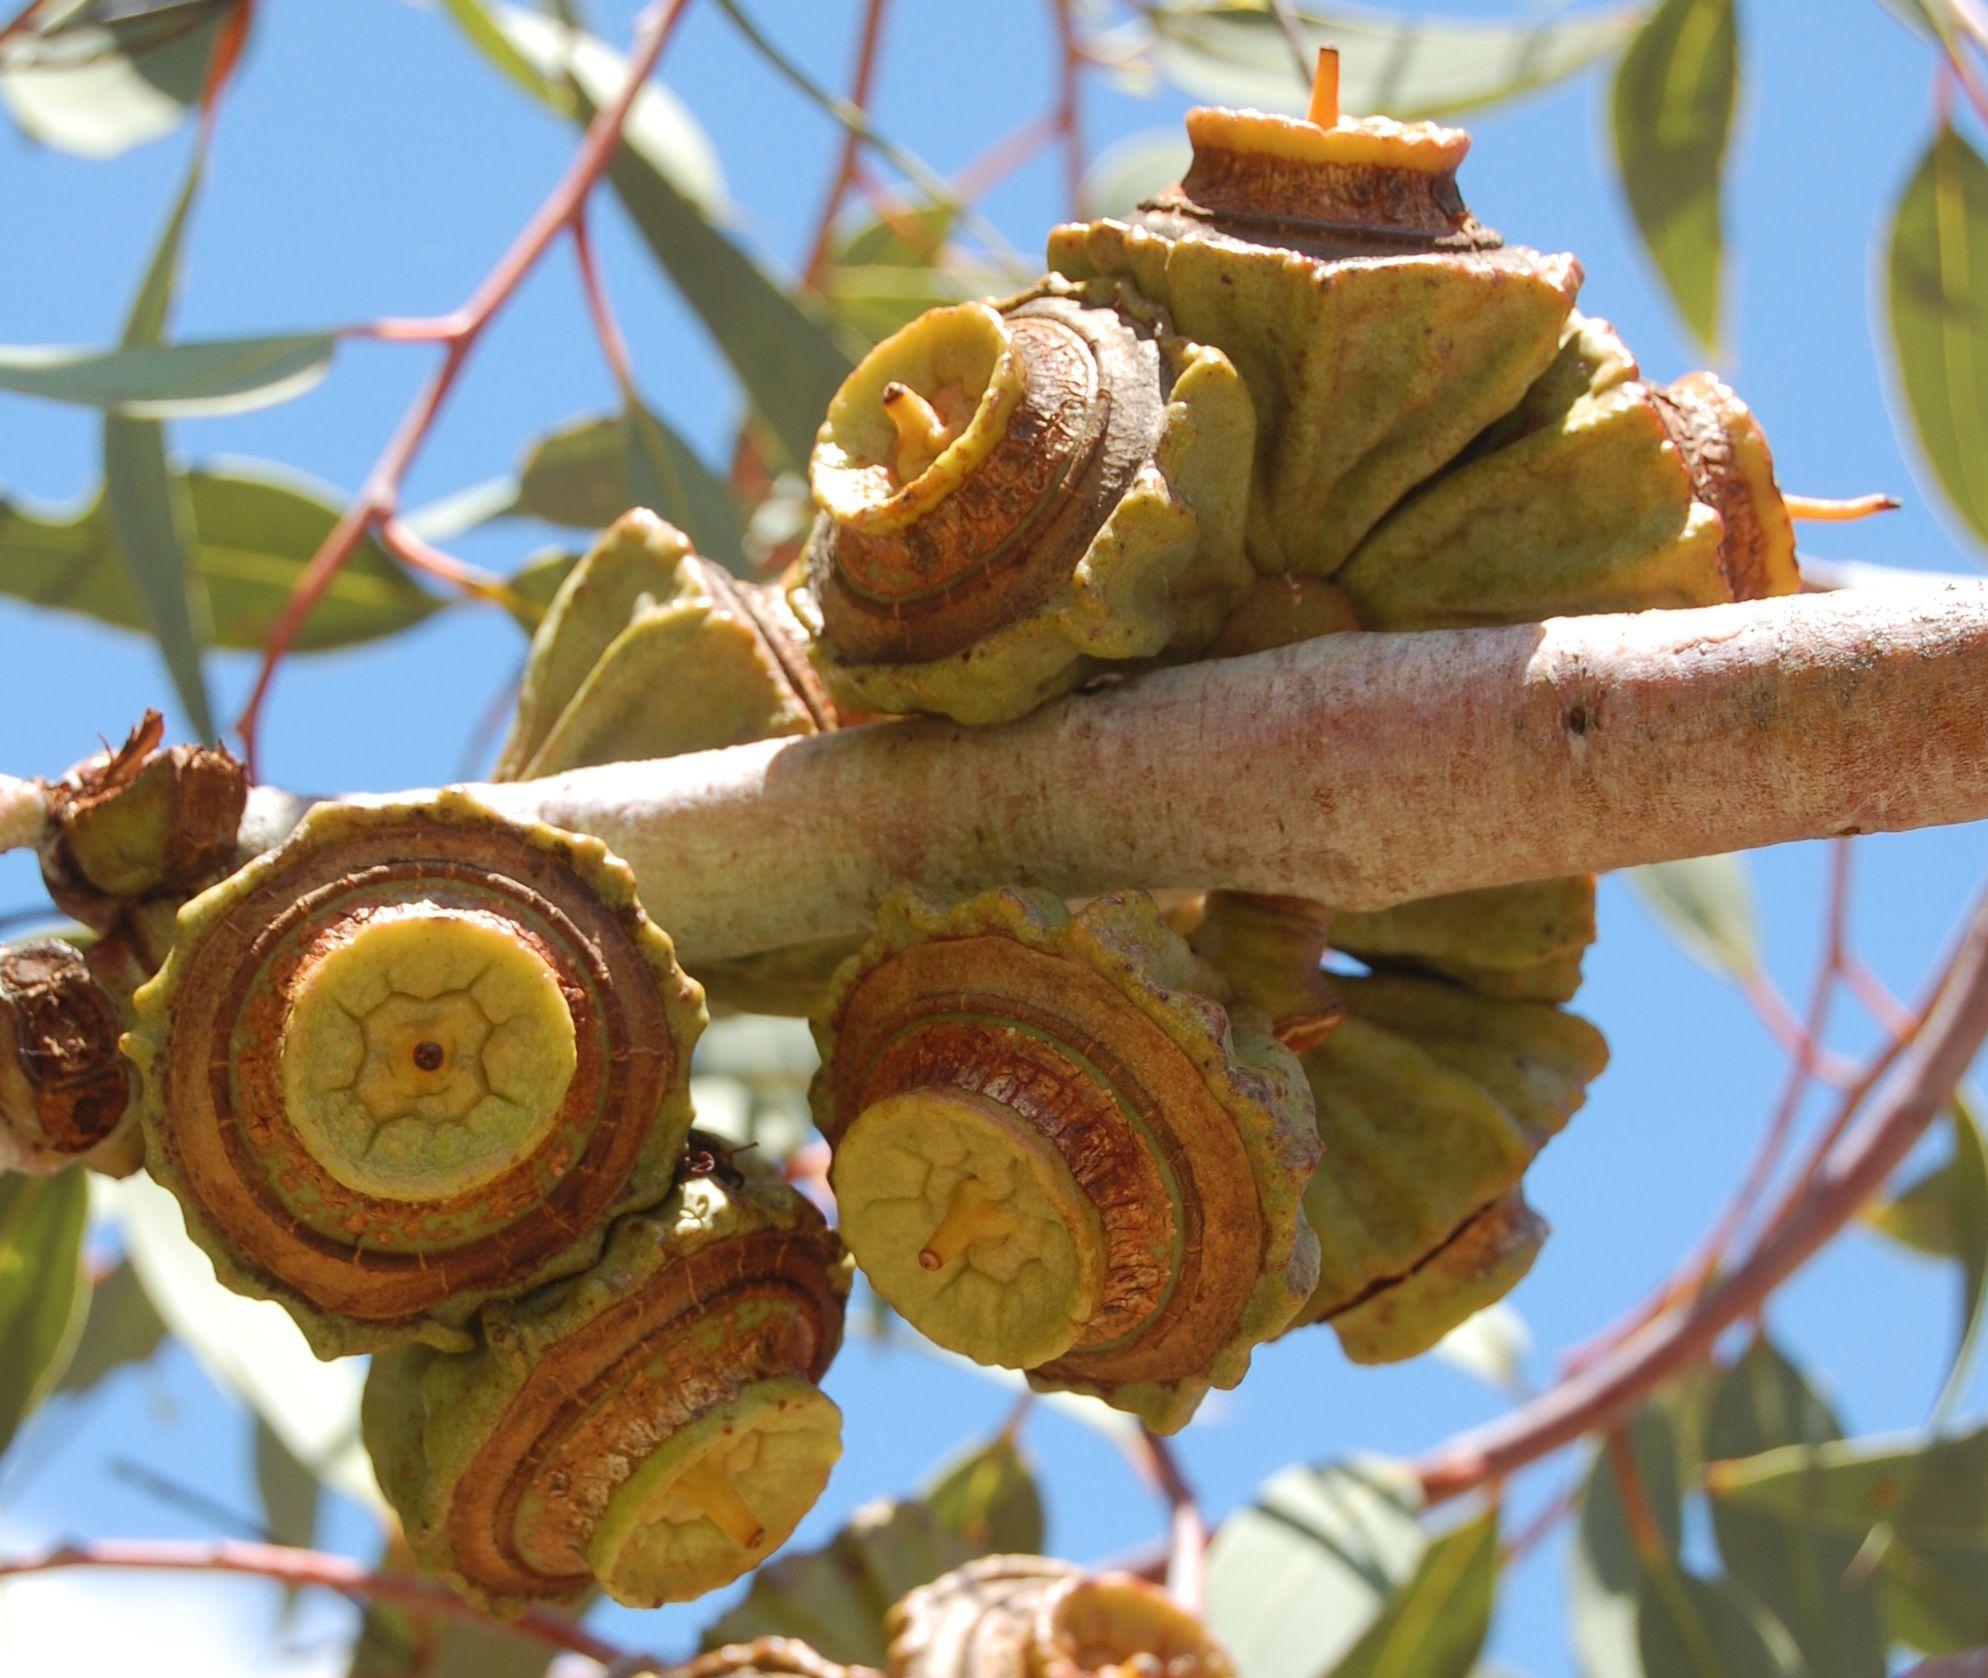 Pin By Carolyn On Plant Life Australian Native Plants Australian Wildflowers Seed Pods